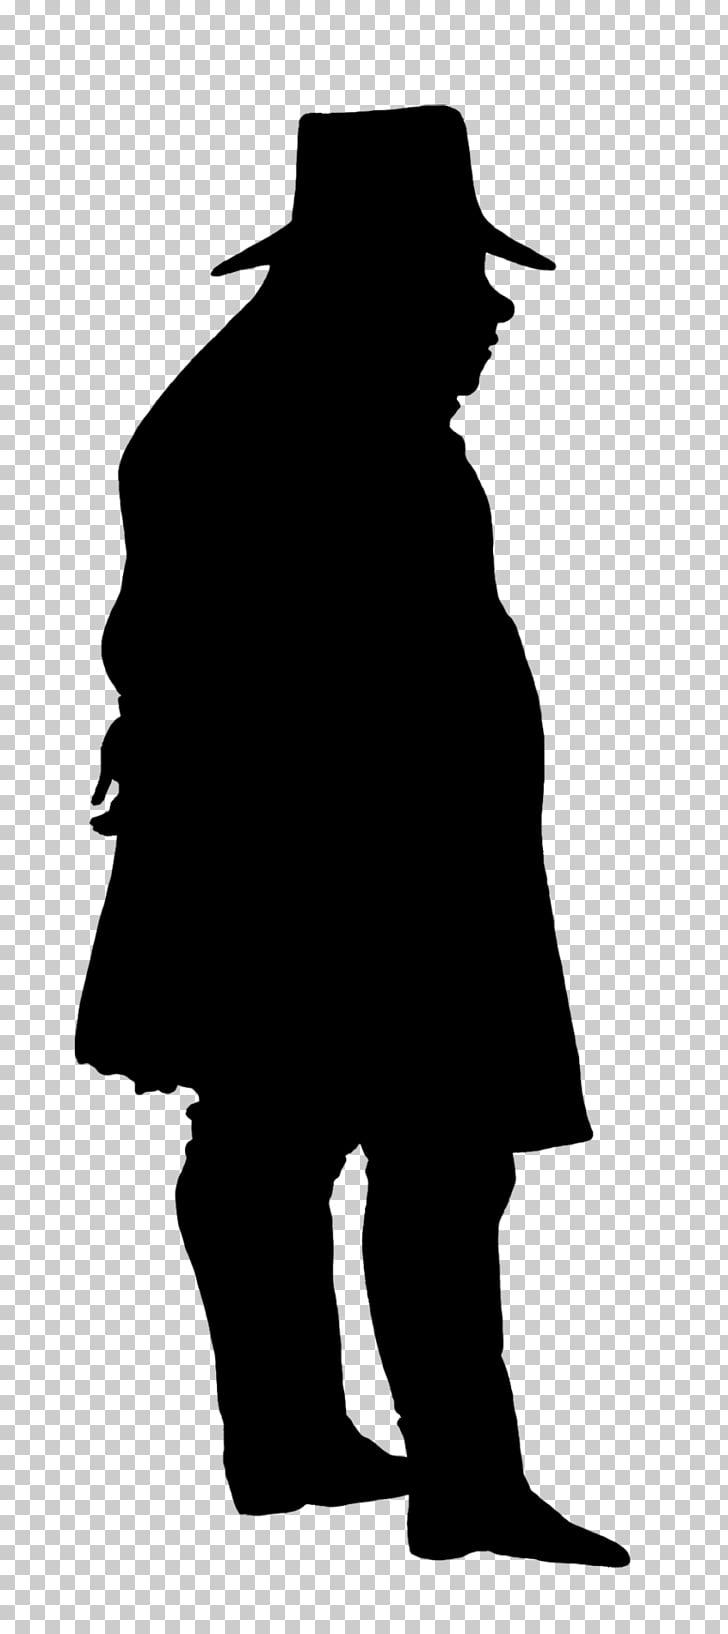 hight resolution of victorian era silhouette gentleman man silhouette png clipart